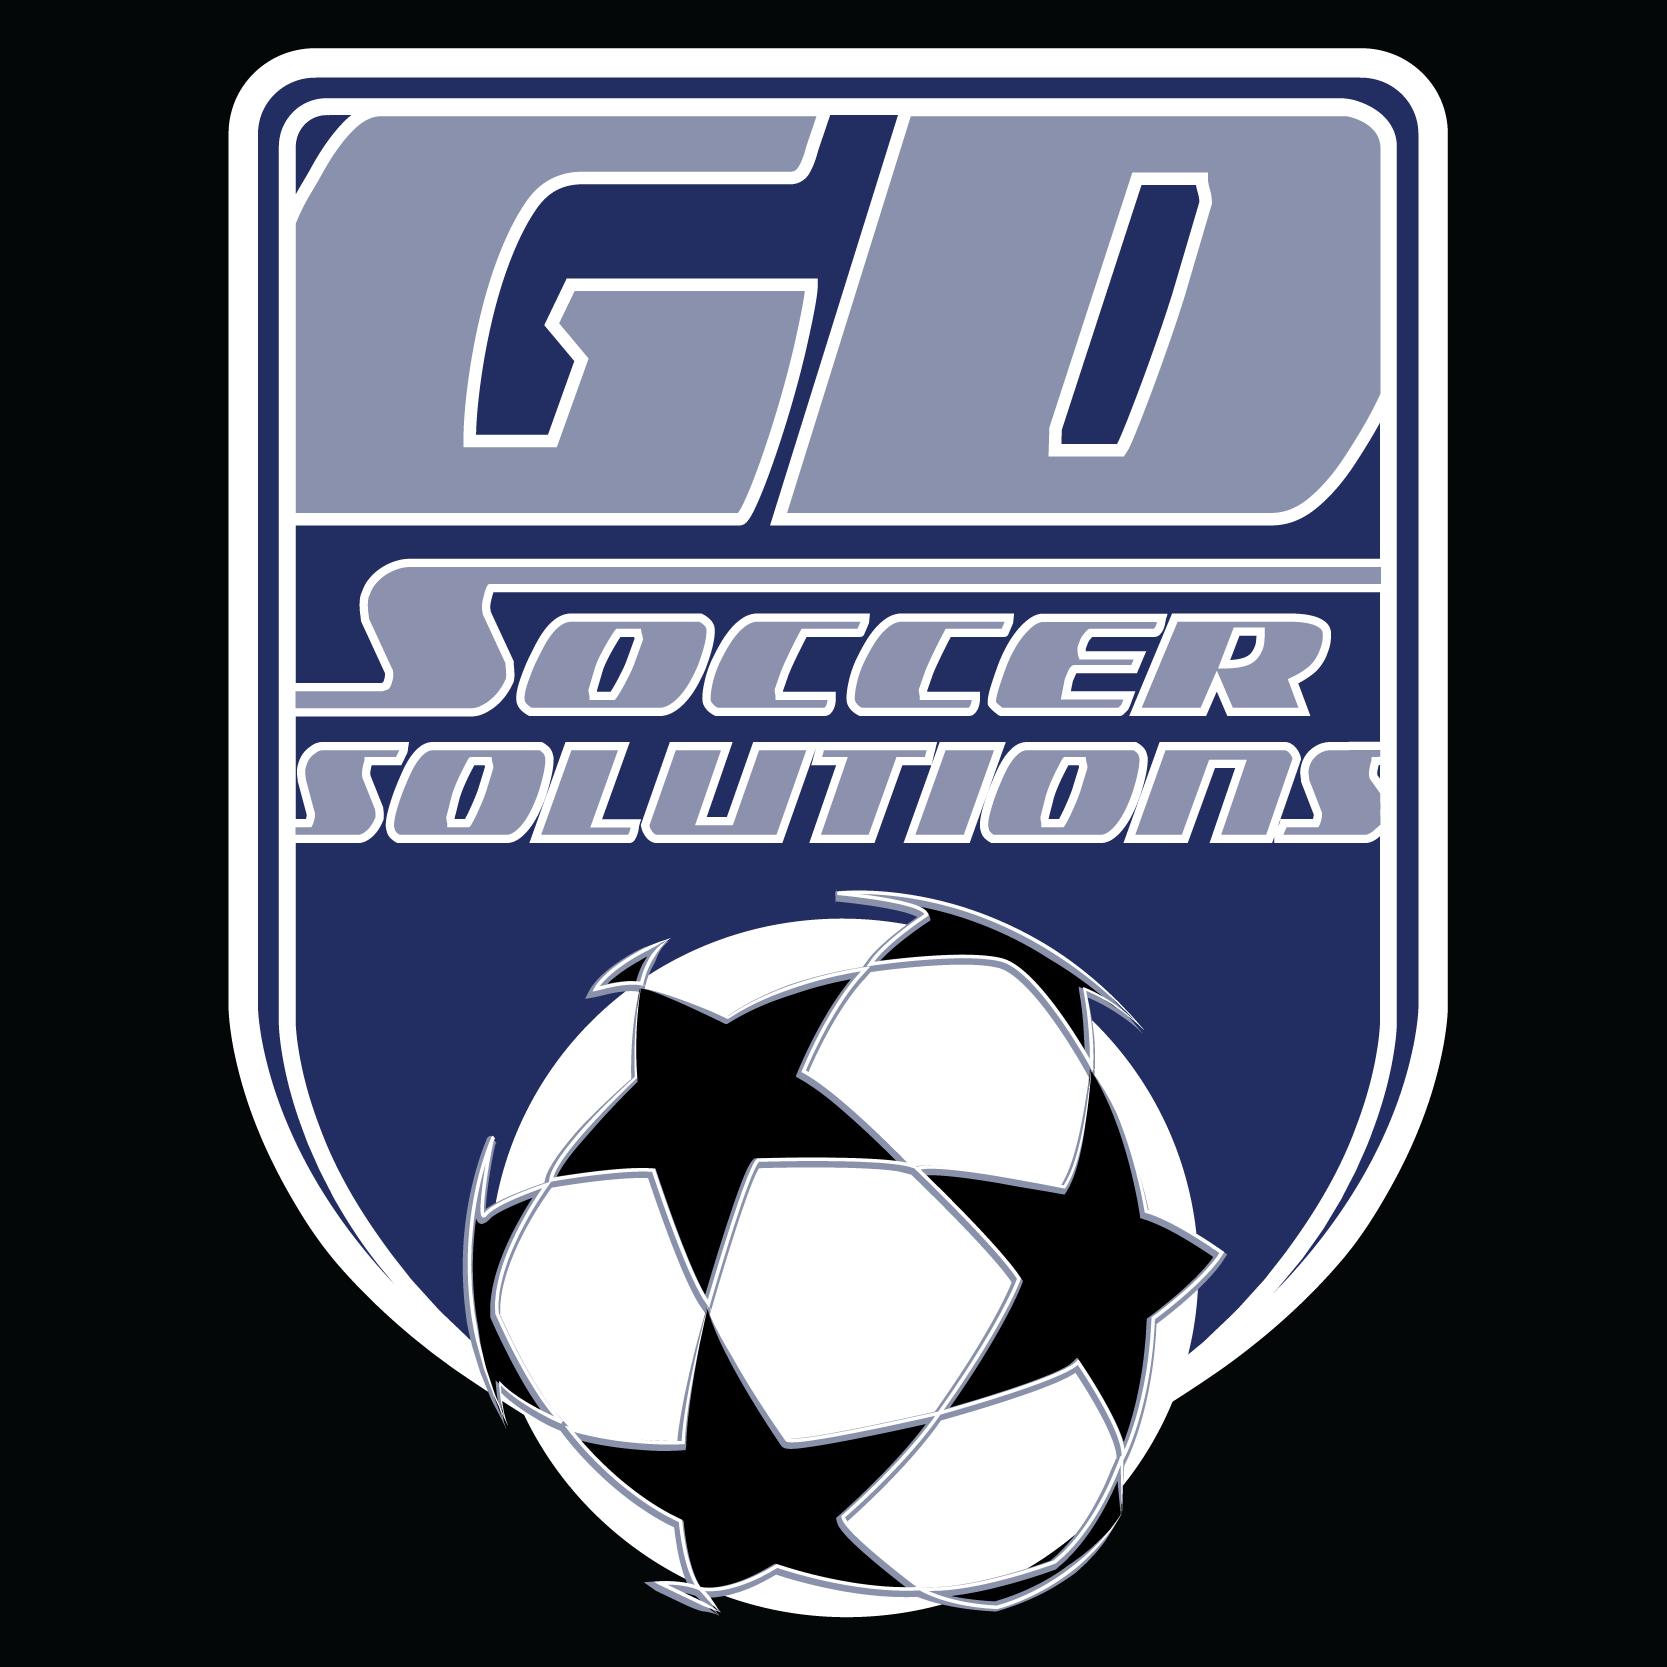 G.D.SoccerSolutions.png